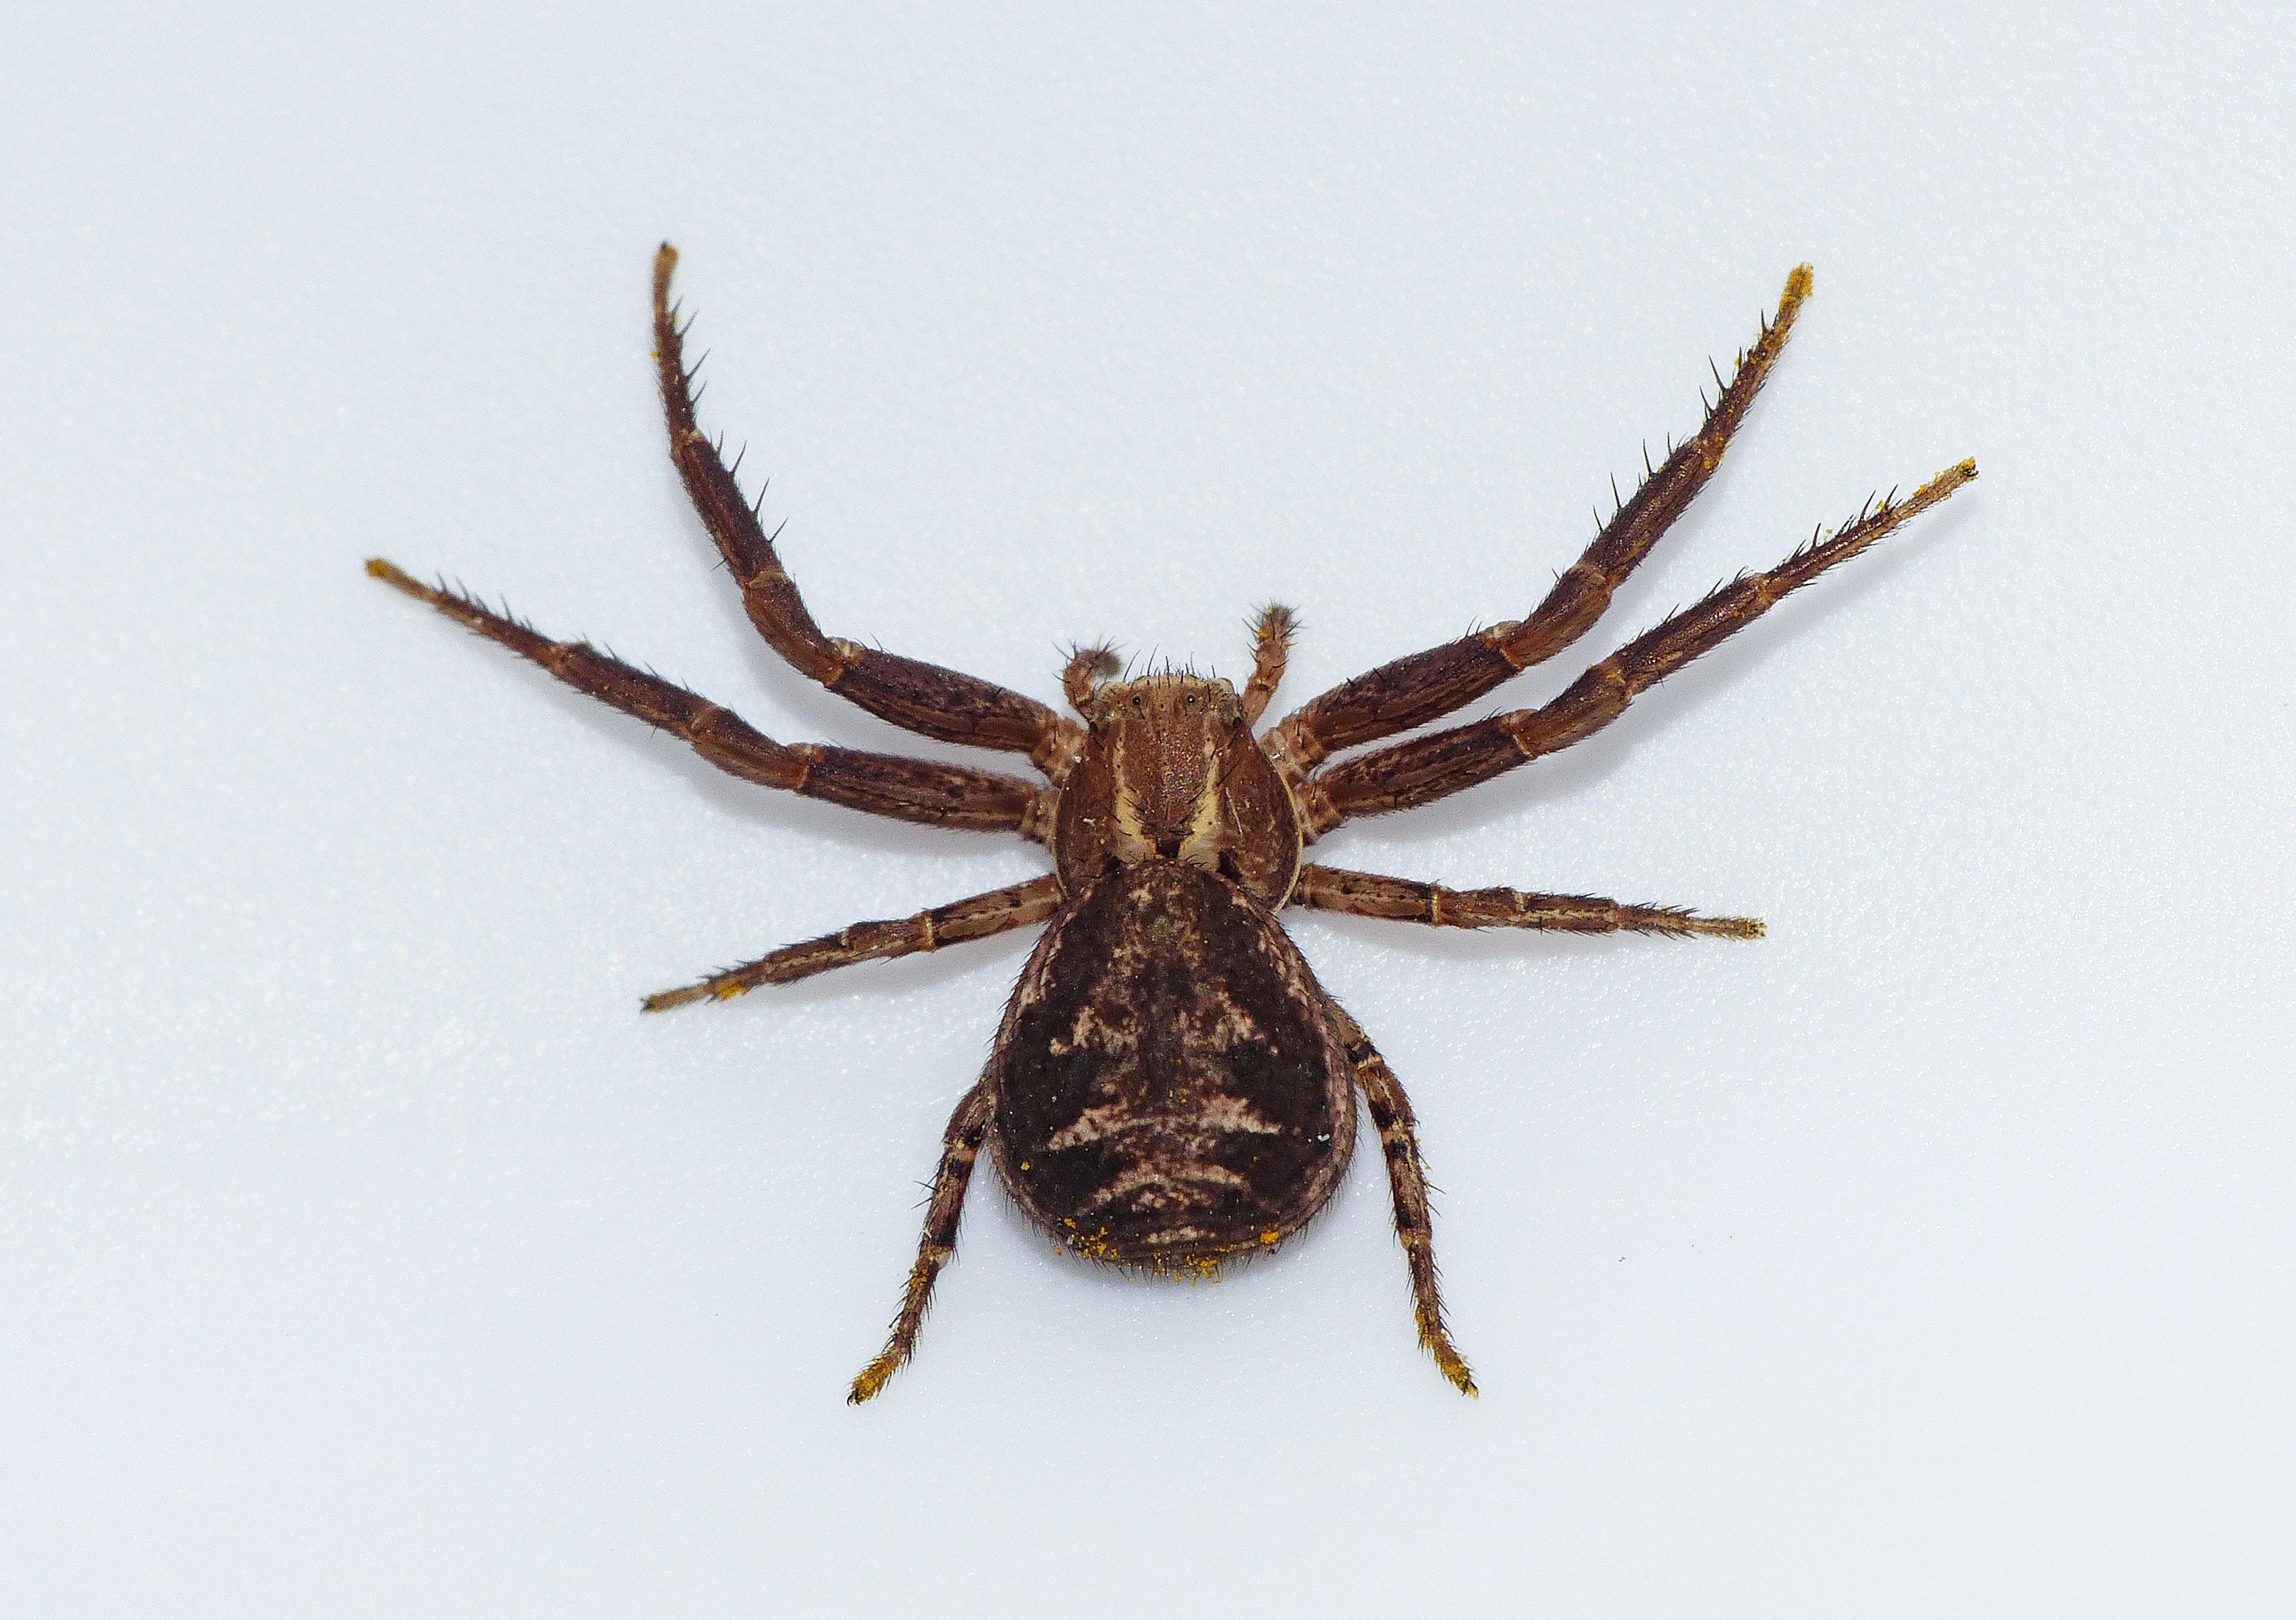 Picture of Xysticus cristatus - Dorsal